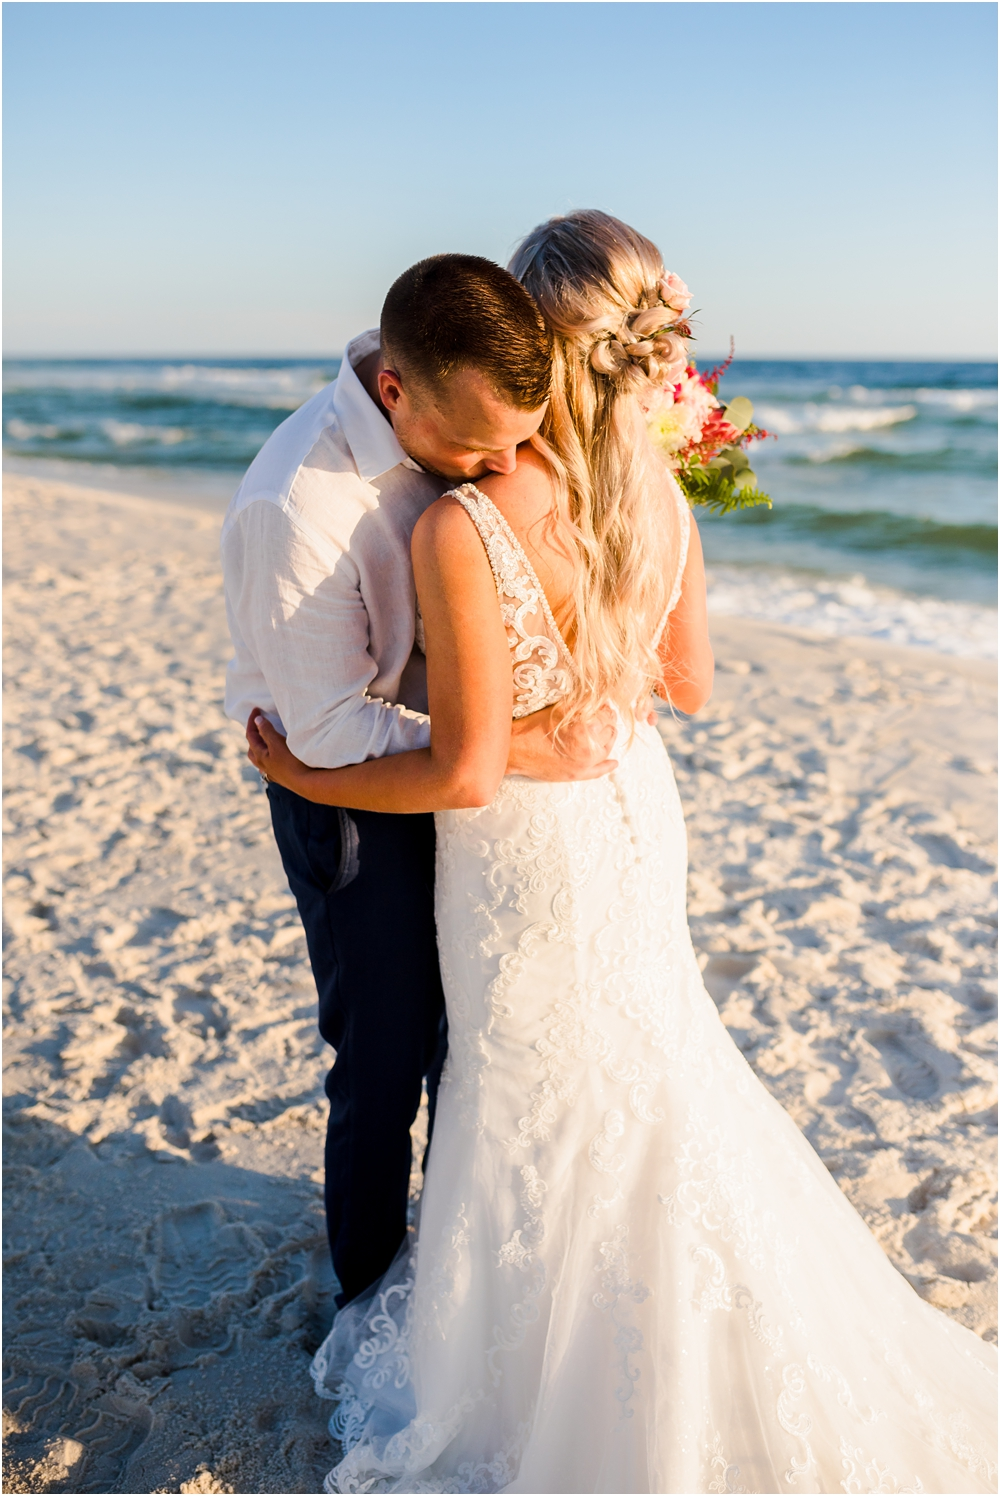 mcglothlin-wedding-kiersten-stevenson-photography-30a-panama-city-beach-dothan-tallahassee-(97-of-145).jpg